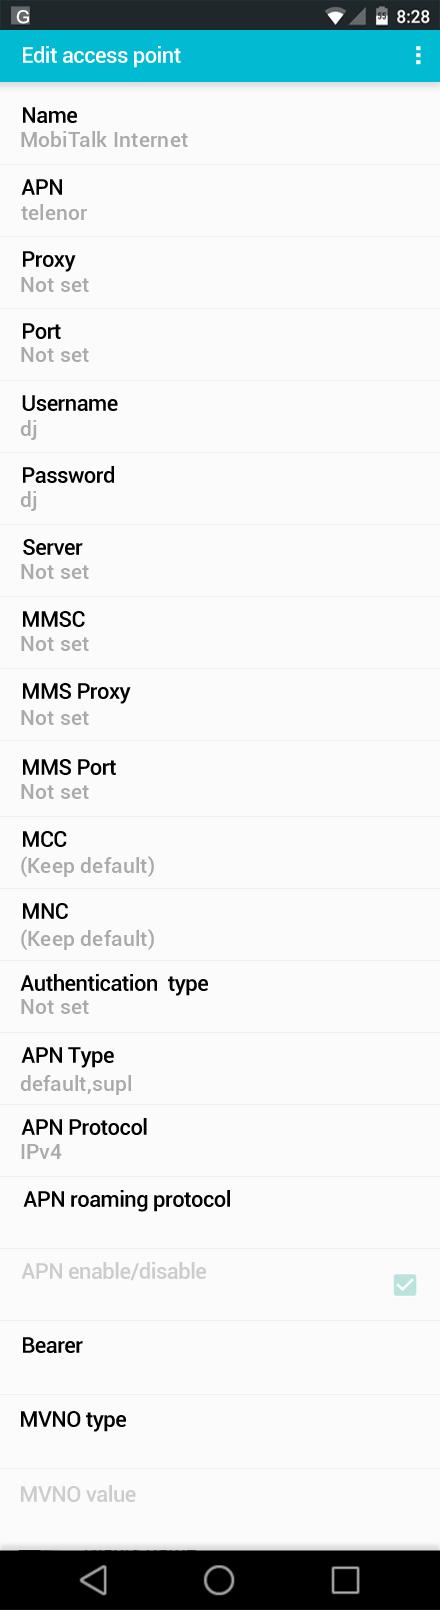 MobiTalk Internet APN settings for Android screenshot